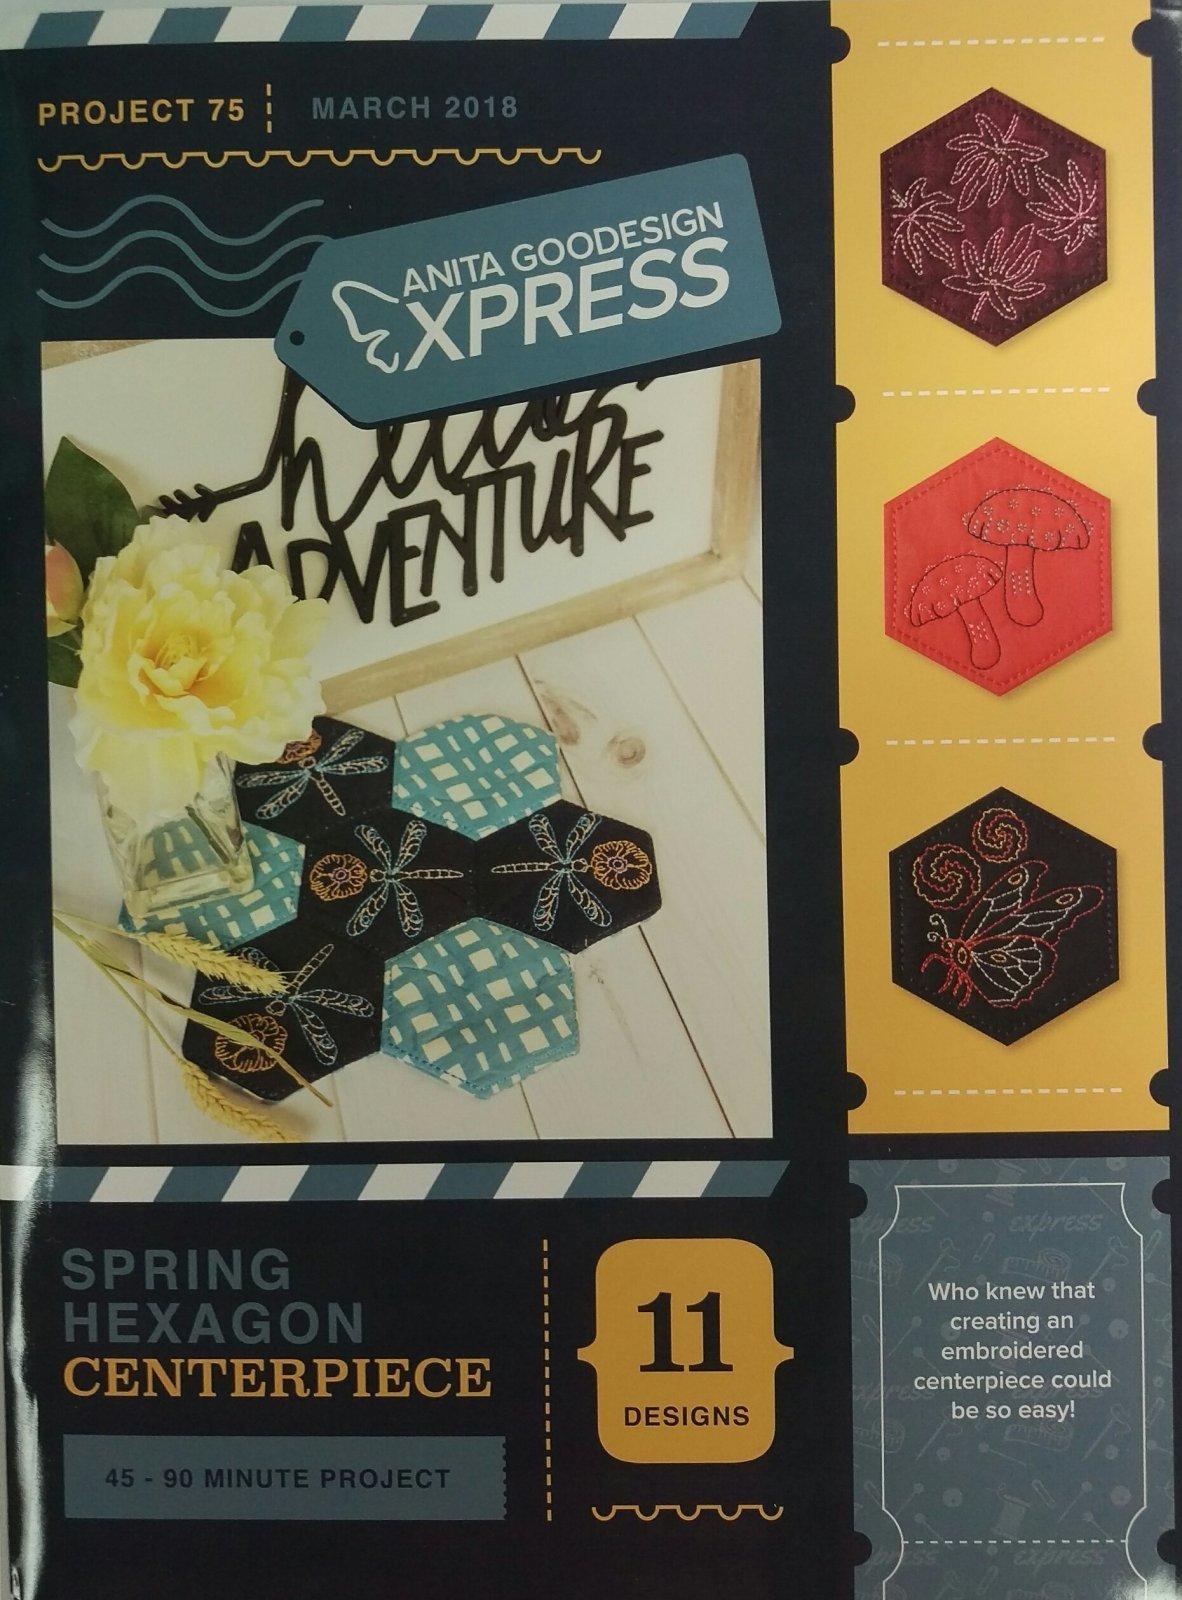 Spring Hexagon - Anita Goodesigns Express projects